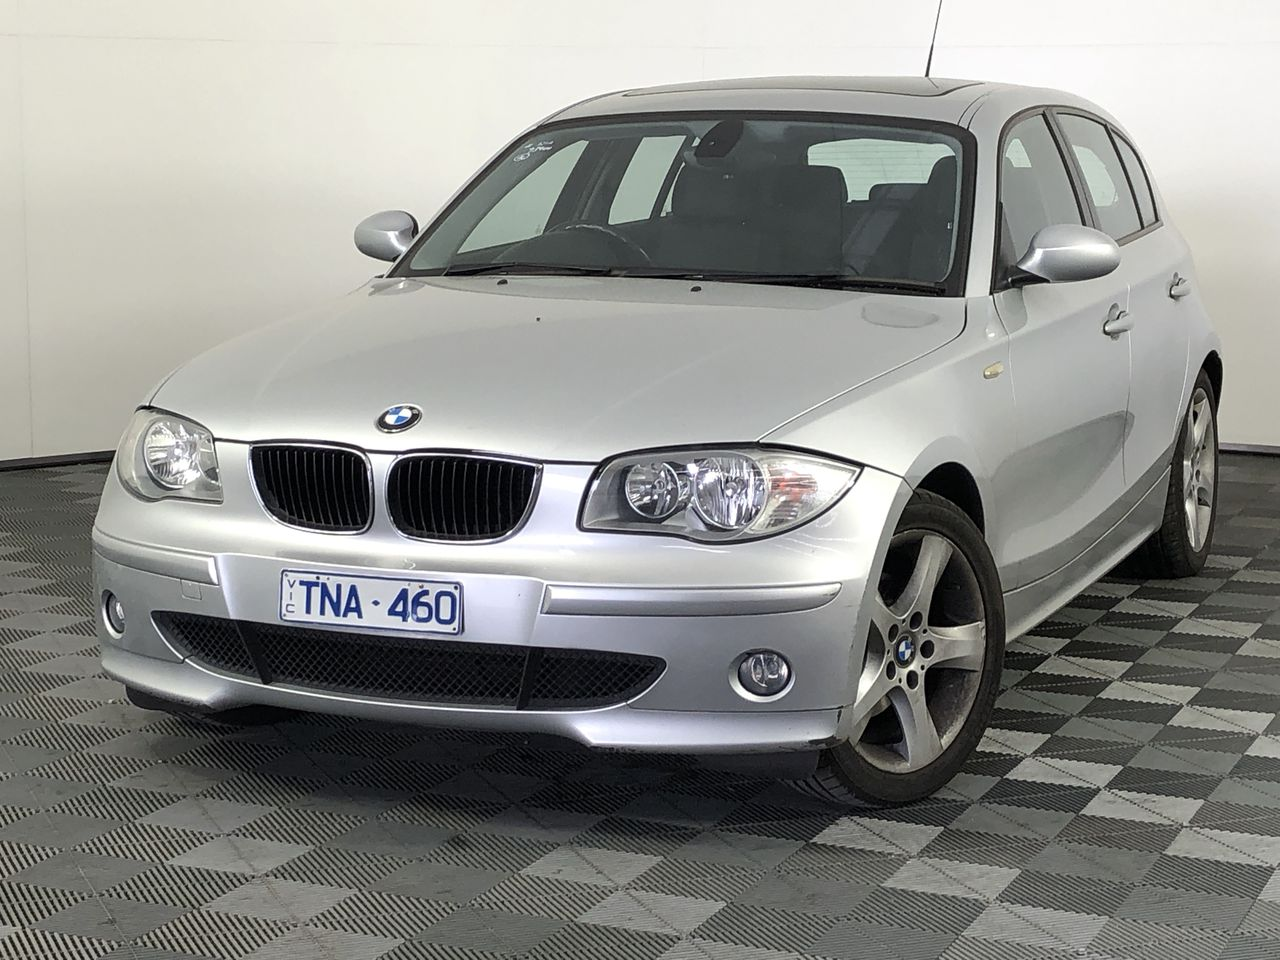 2004 BMW 1 20i E87 Automatic Hatchback